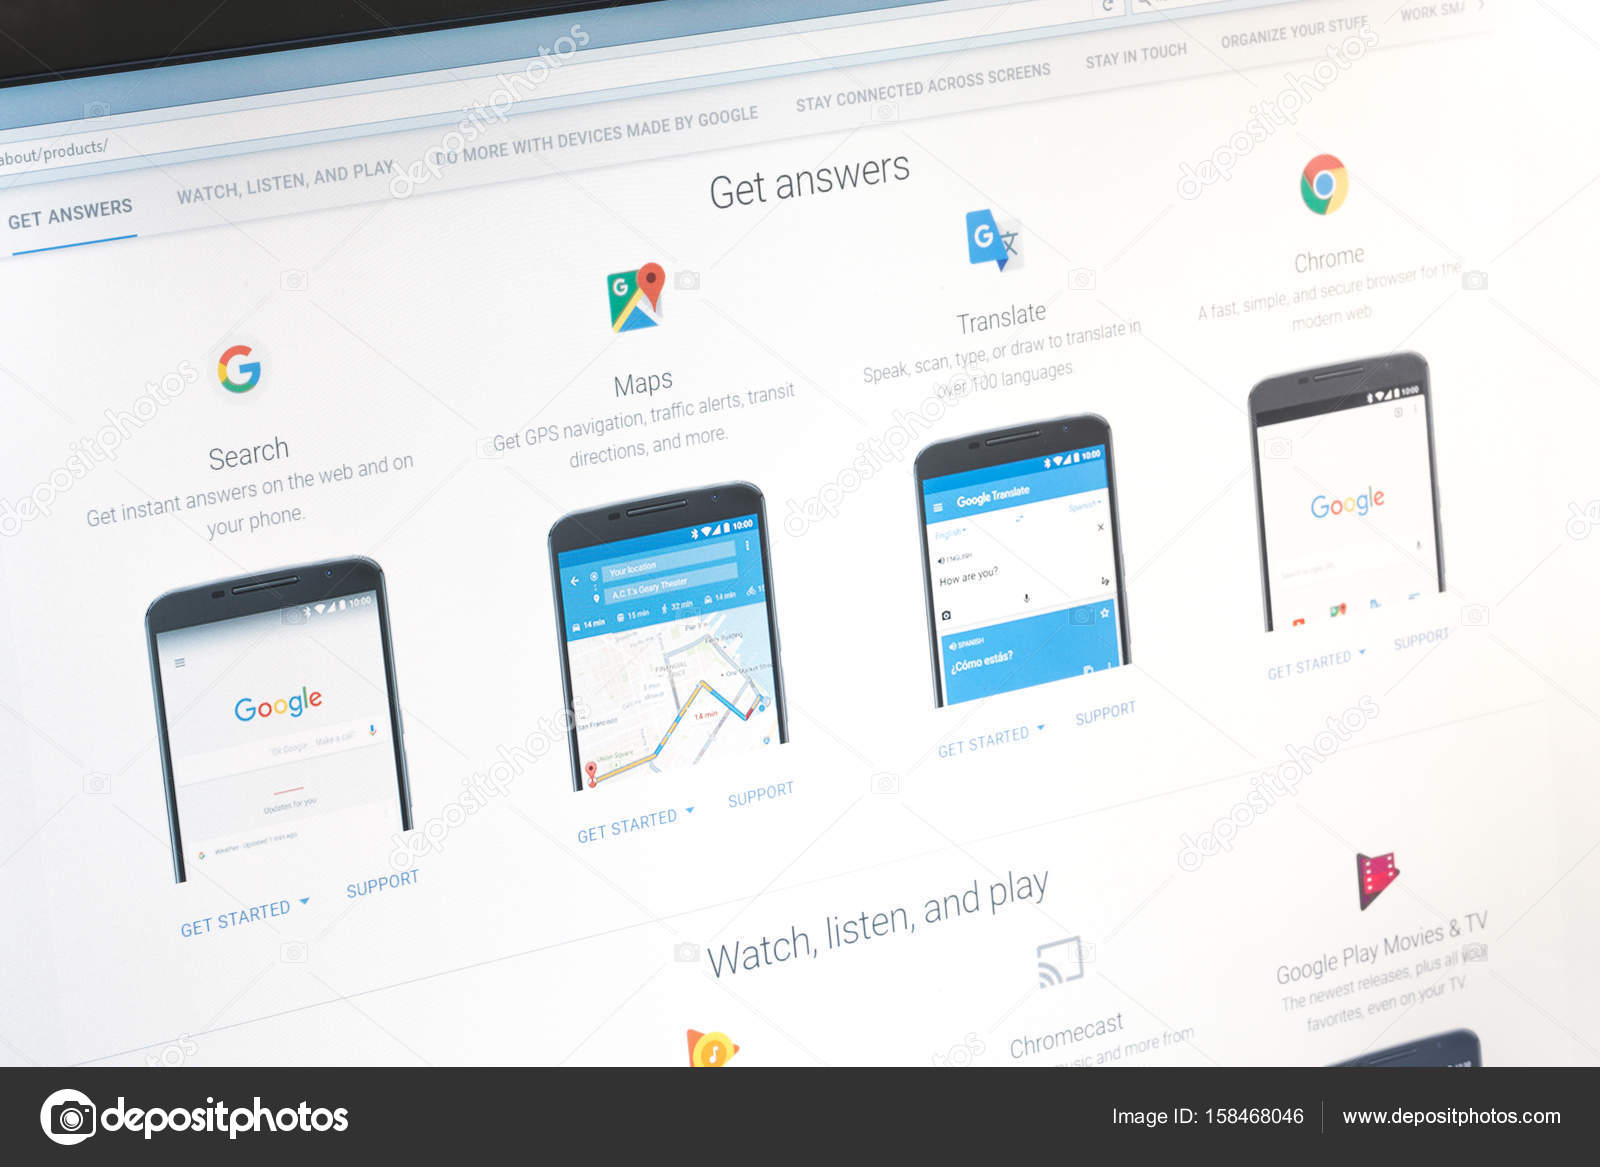 Chrome browser for enterprise | download & support.